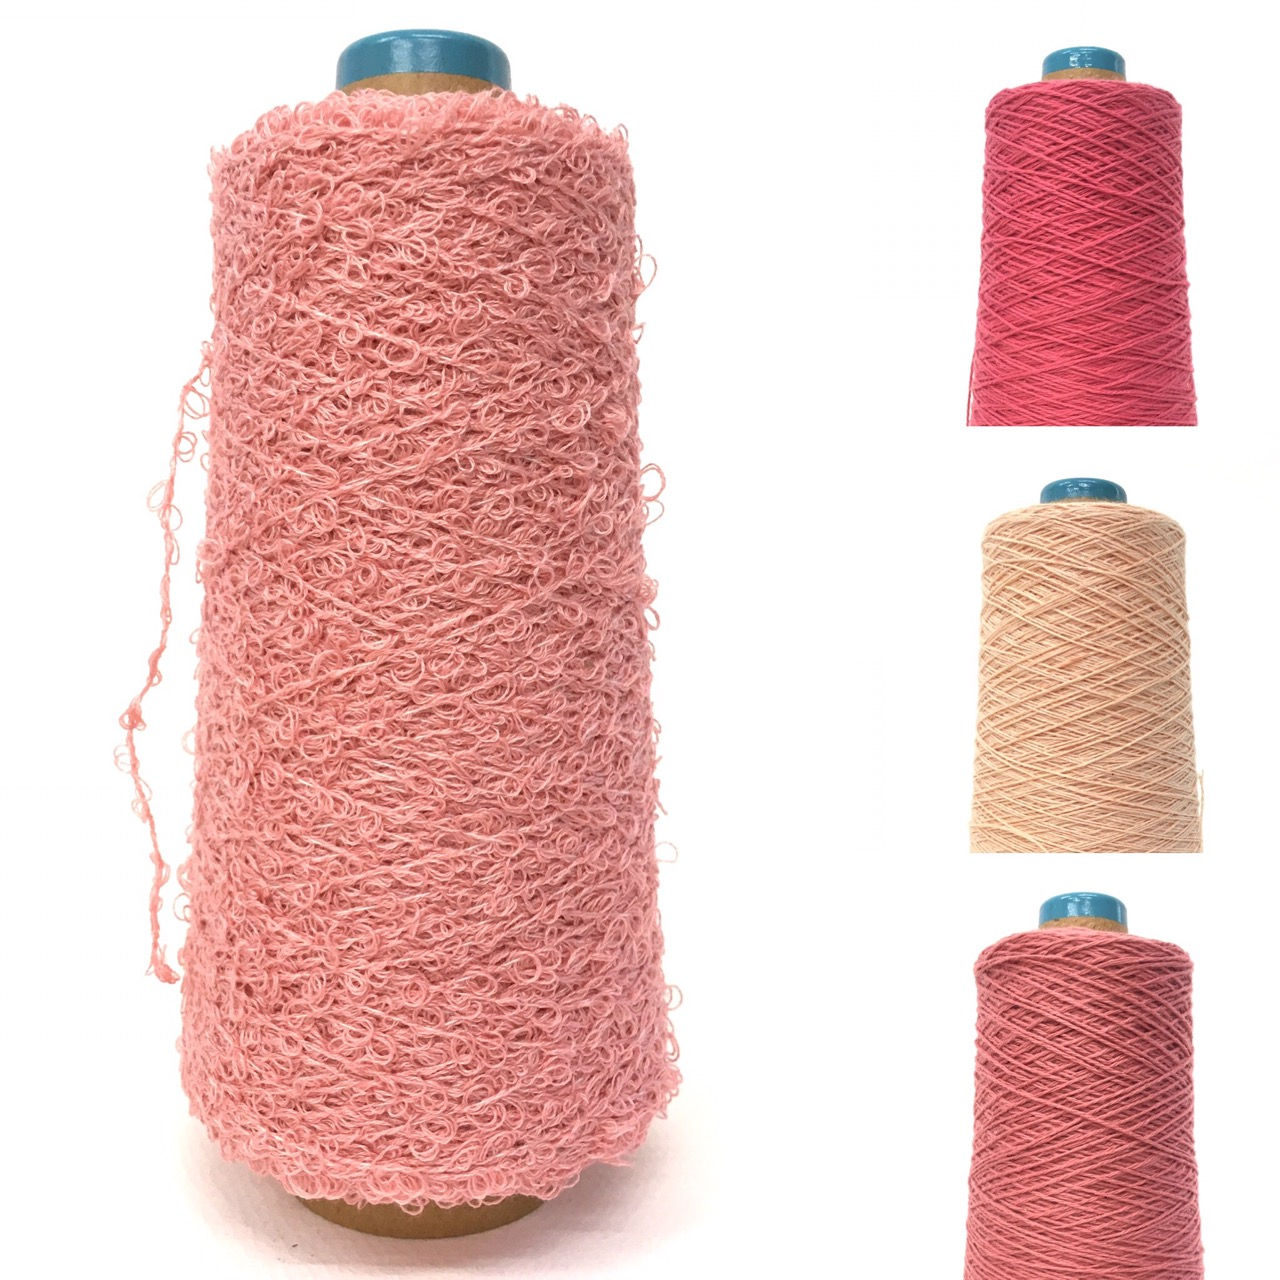 SAORI yarns are available through authorized distributors.